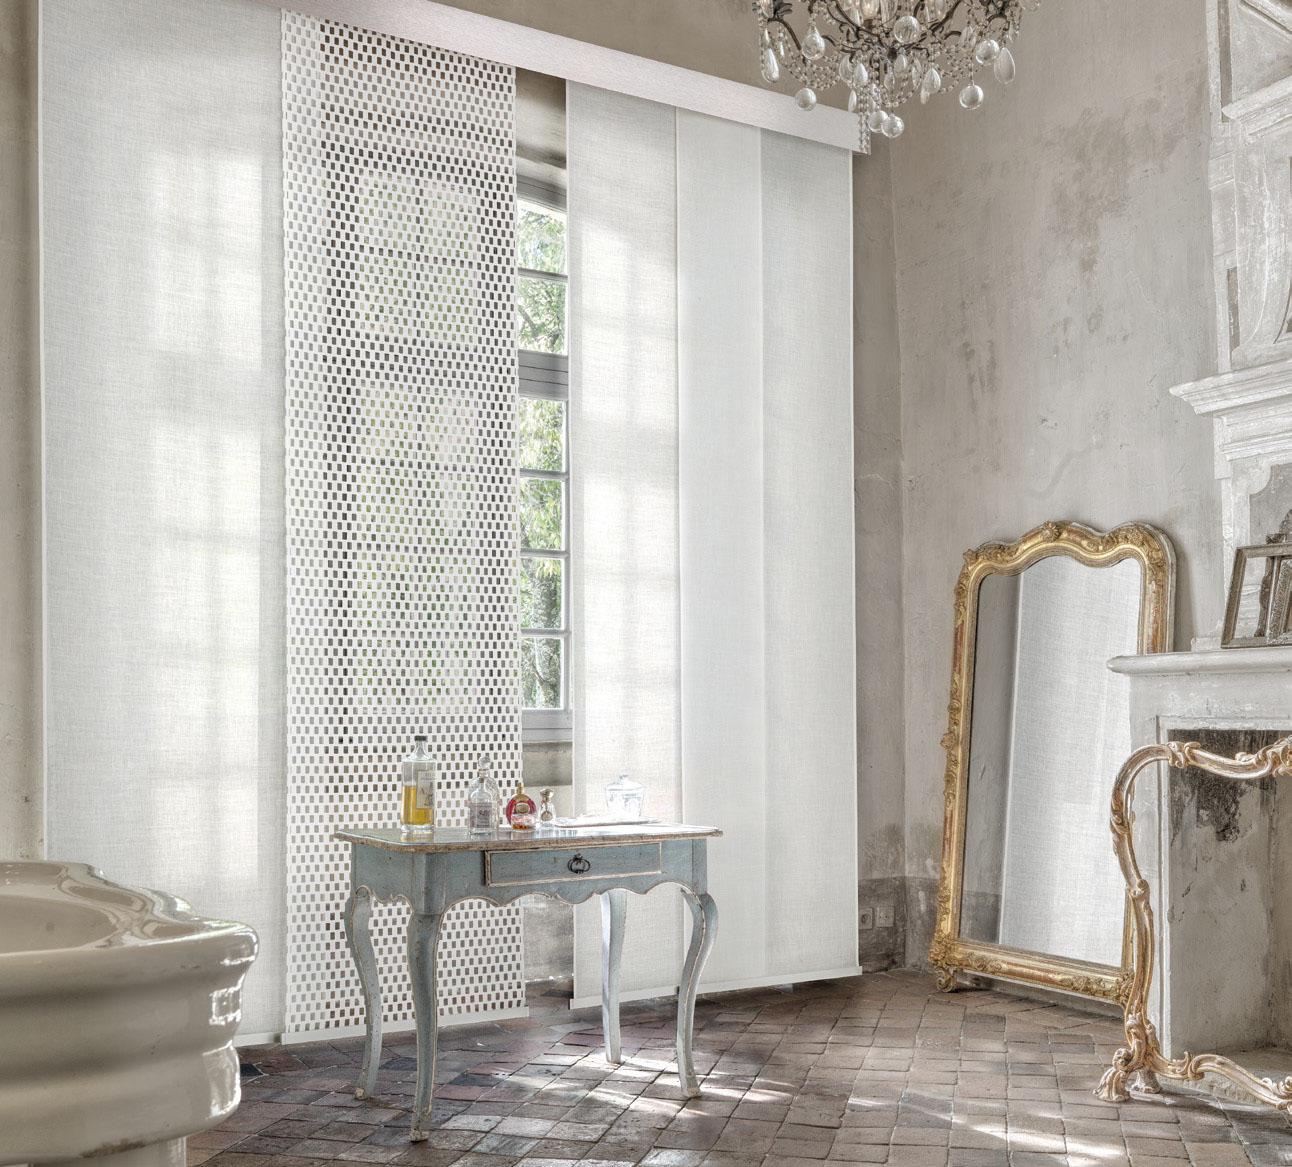 Great casa moderna interno pittura per interni moderna - Pittura casa moderna ...